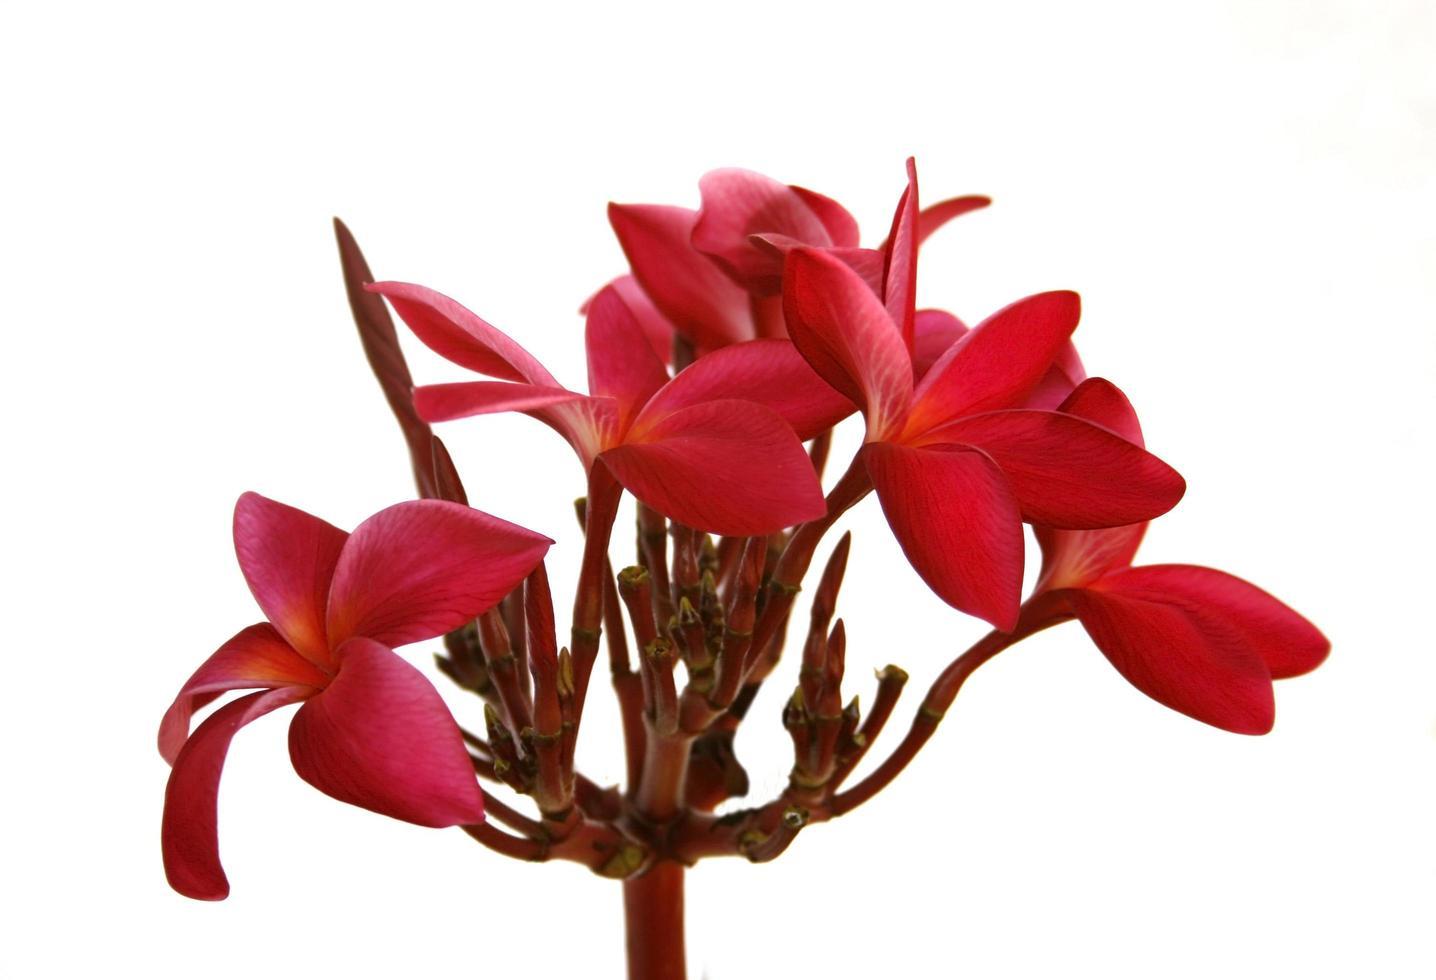 fiori di frangipani rossi foto